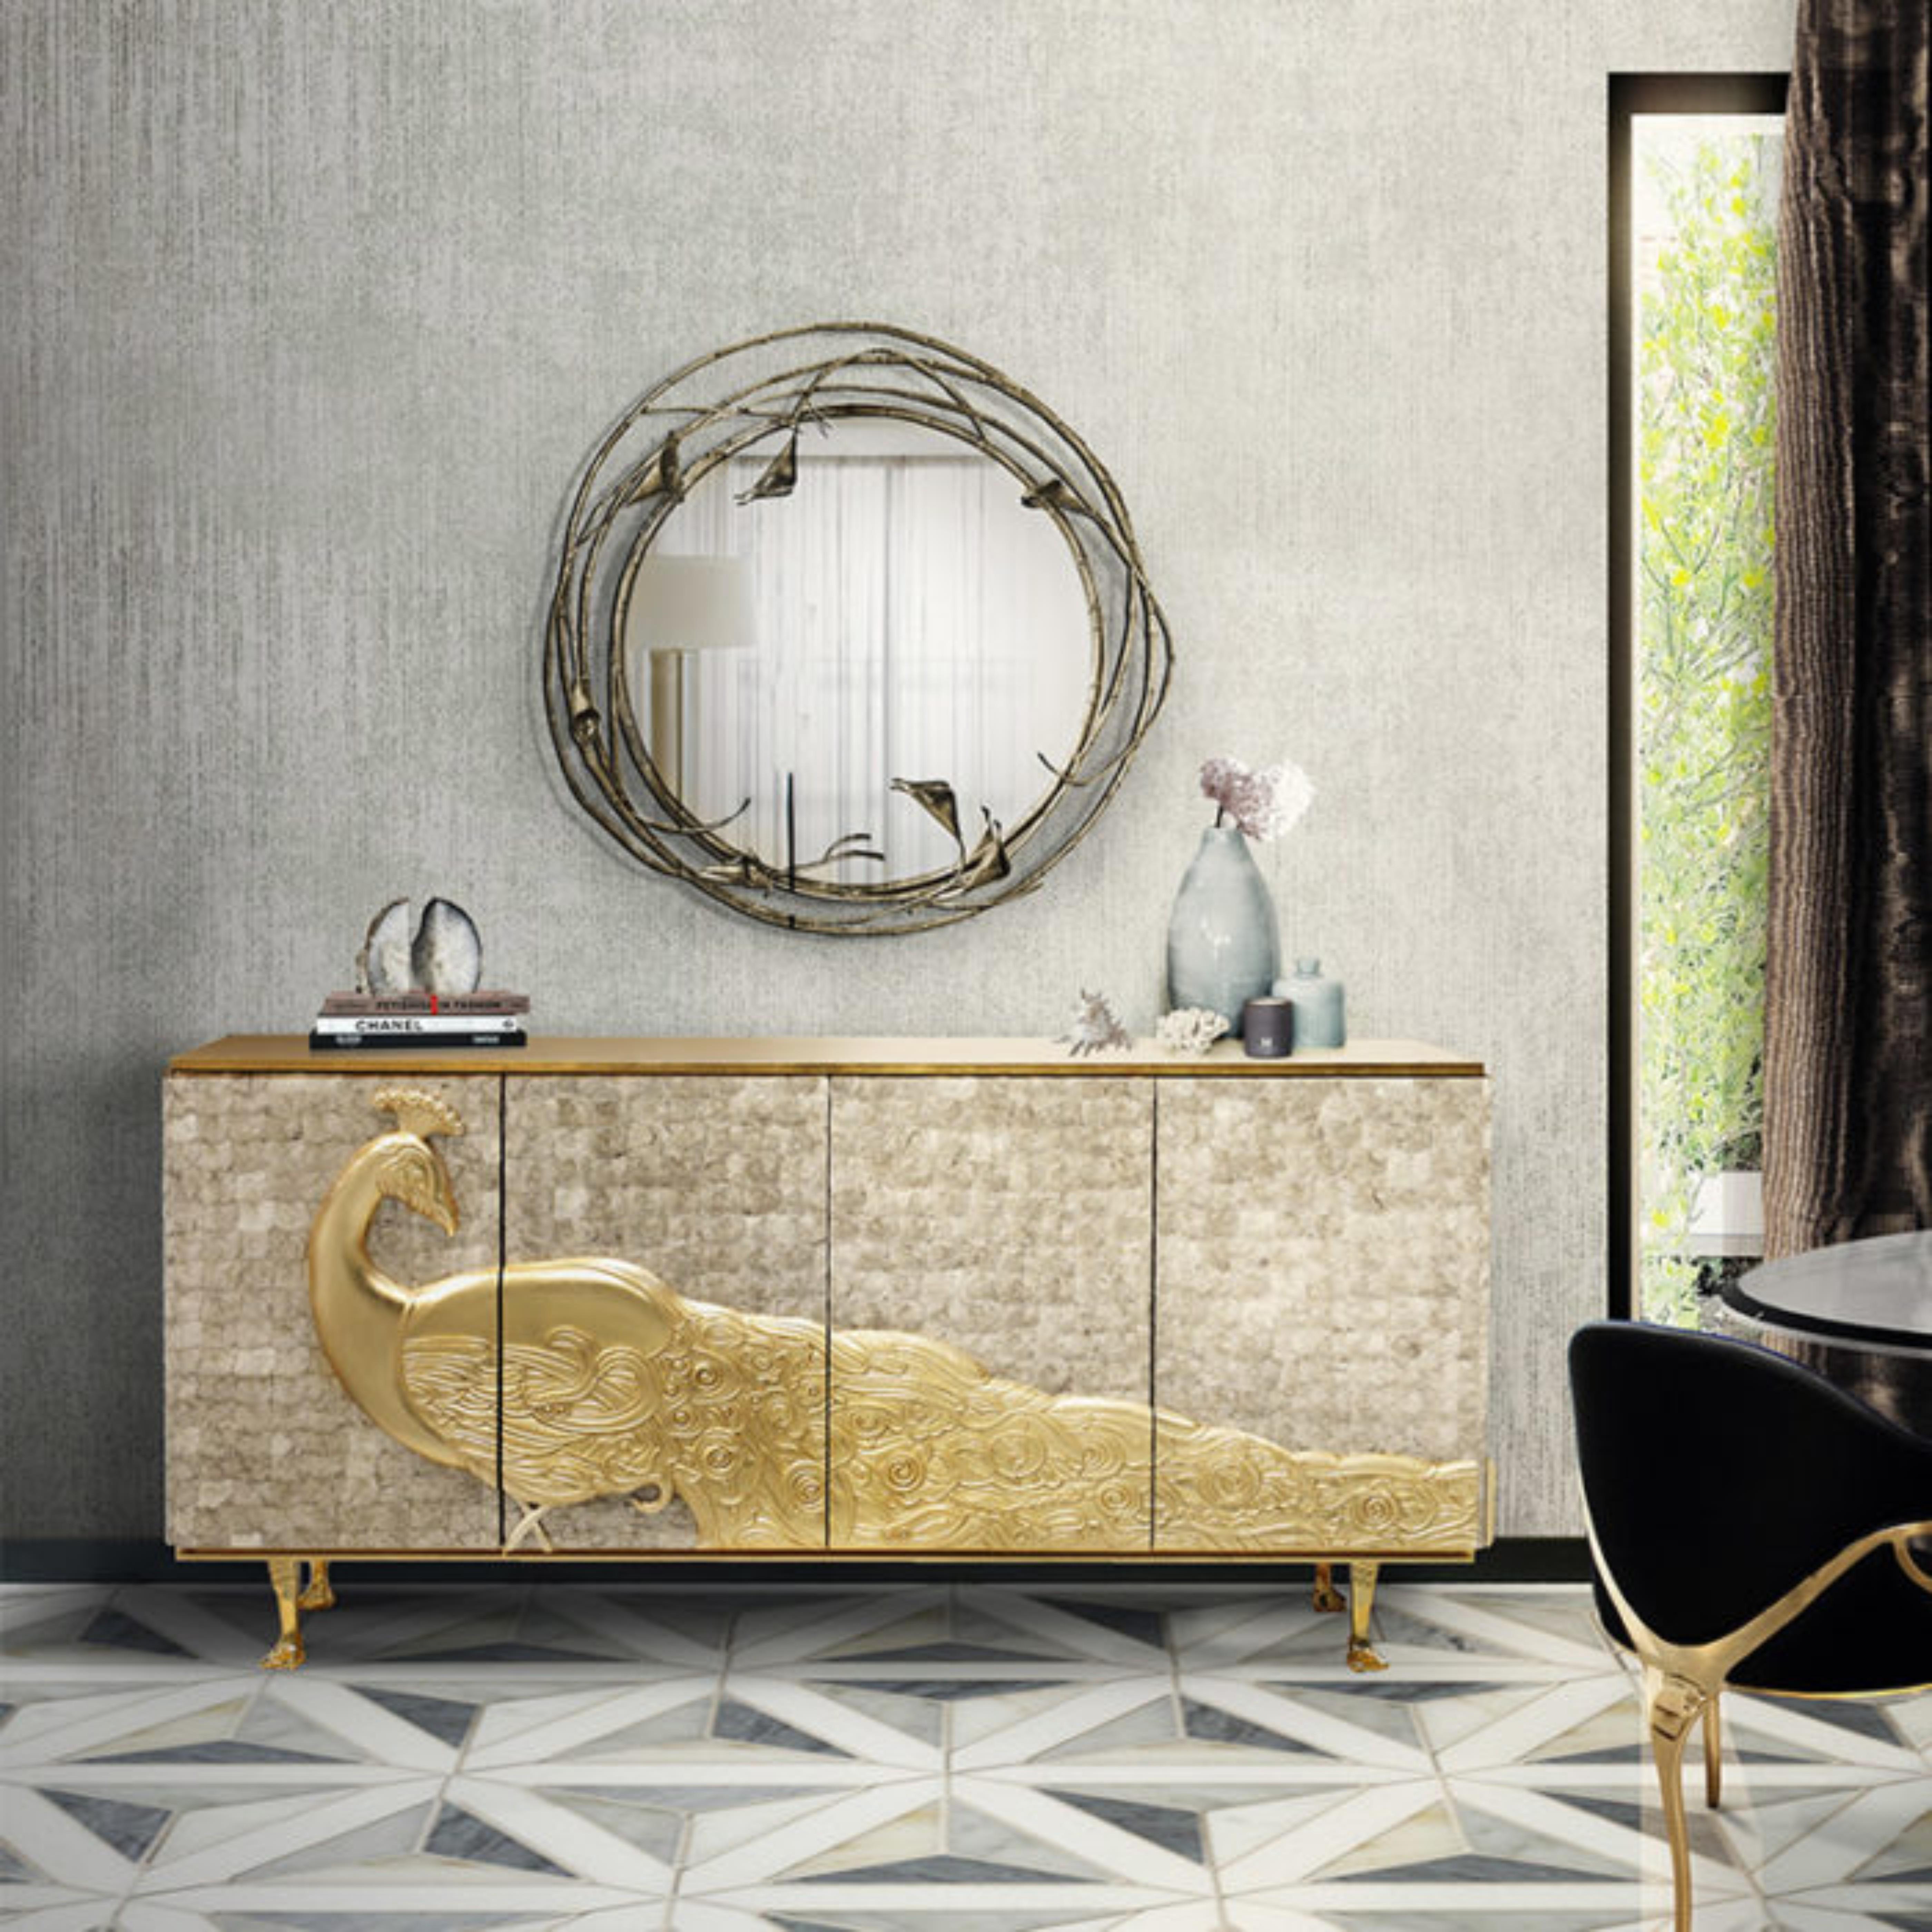 dining room decor ideas 5 Astonishing Dining Room Decor Ideas Koket Camelia Cabinet 4 700x700